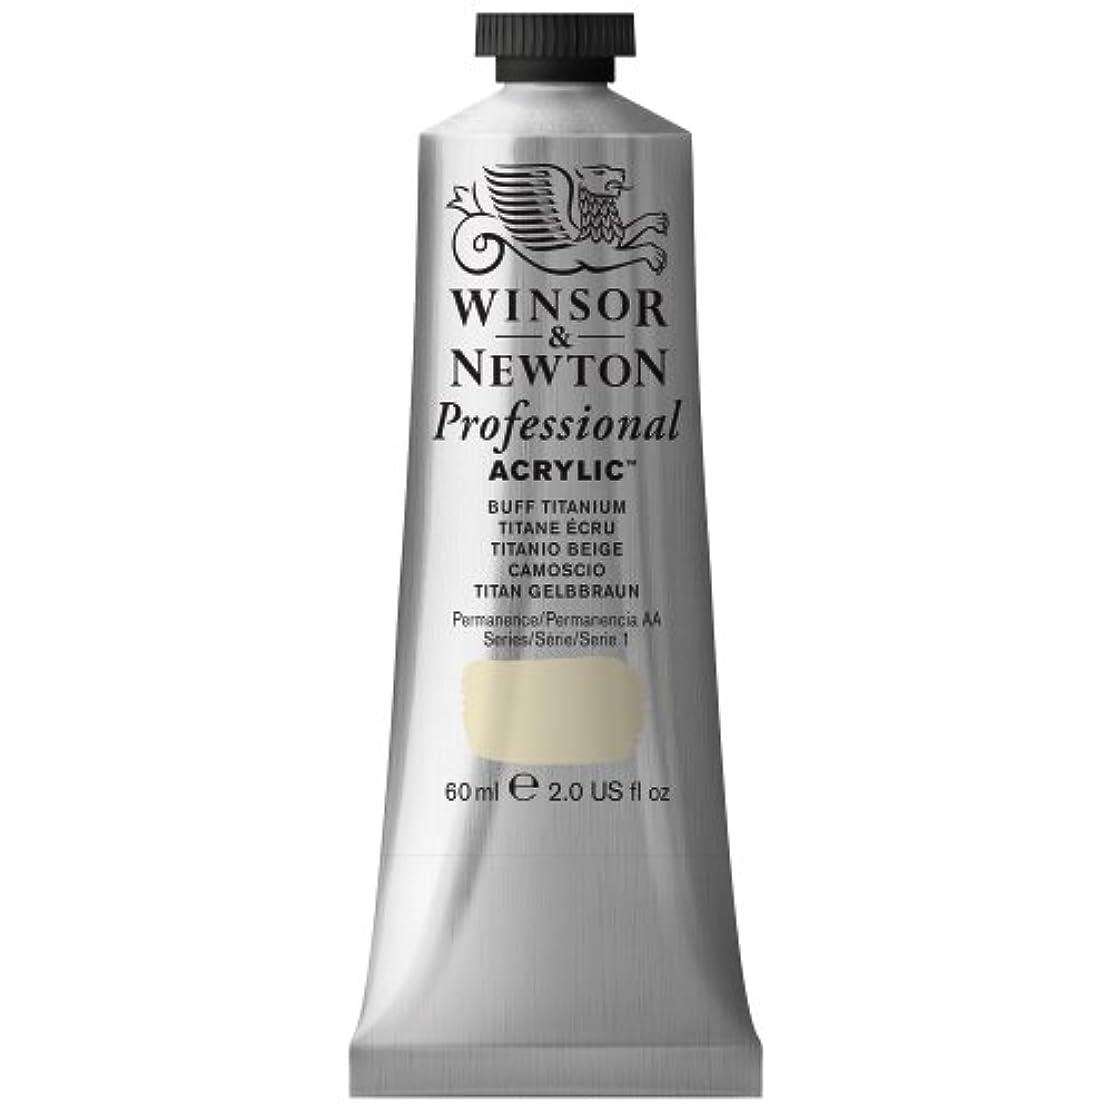 Winsor & Newton Professional Acrylic Color Paint, 60ml Tube, Buff Titanium